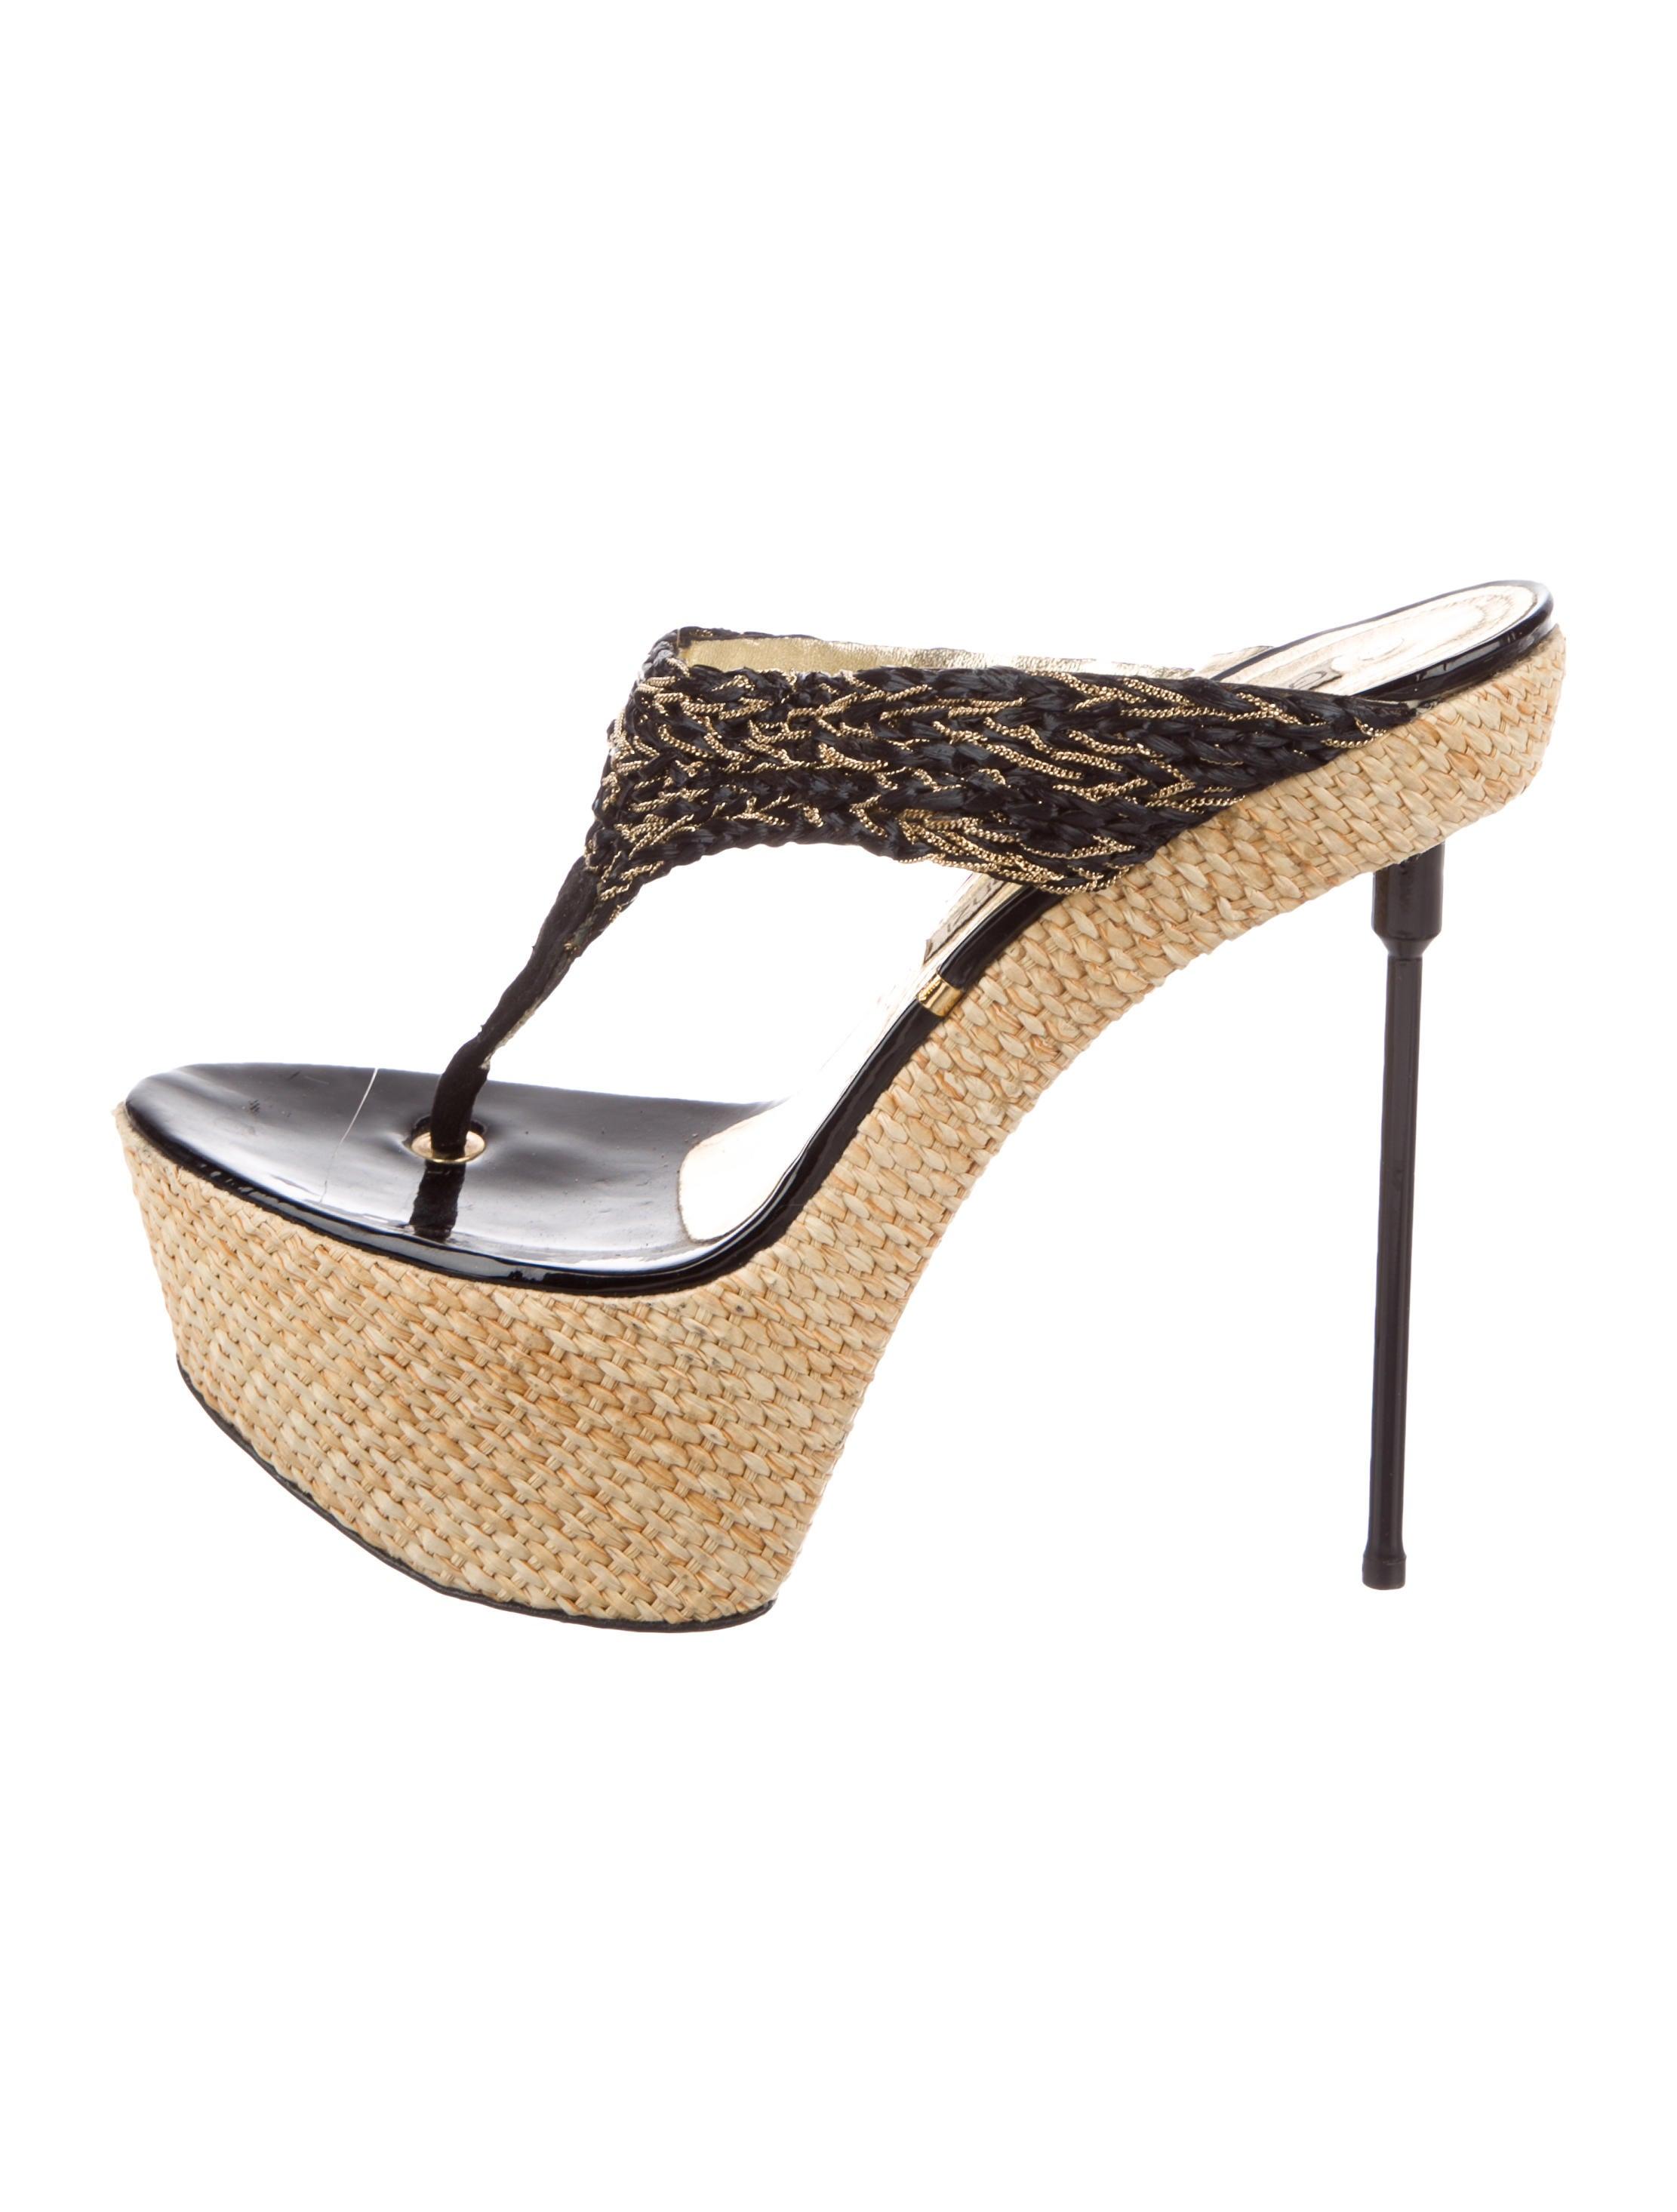 cheap sale discount Gianmarco Lorenzi Platform Thong Sandals sale limited edition Cheapest online sale factory outlet outlet for sale LFam0